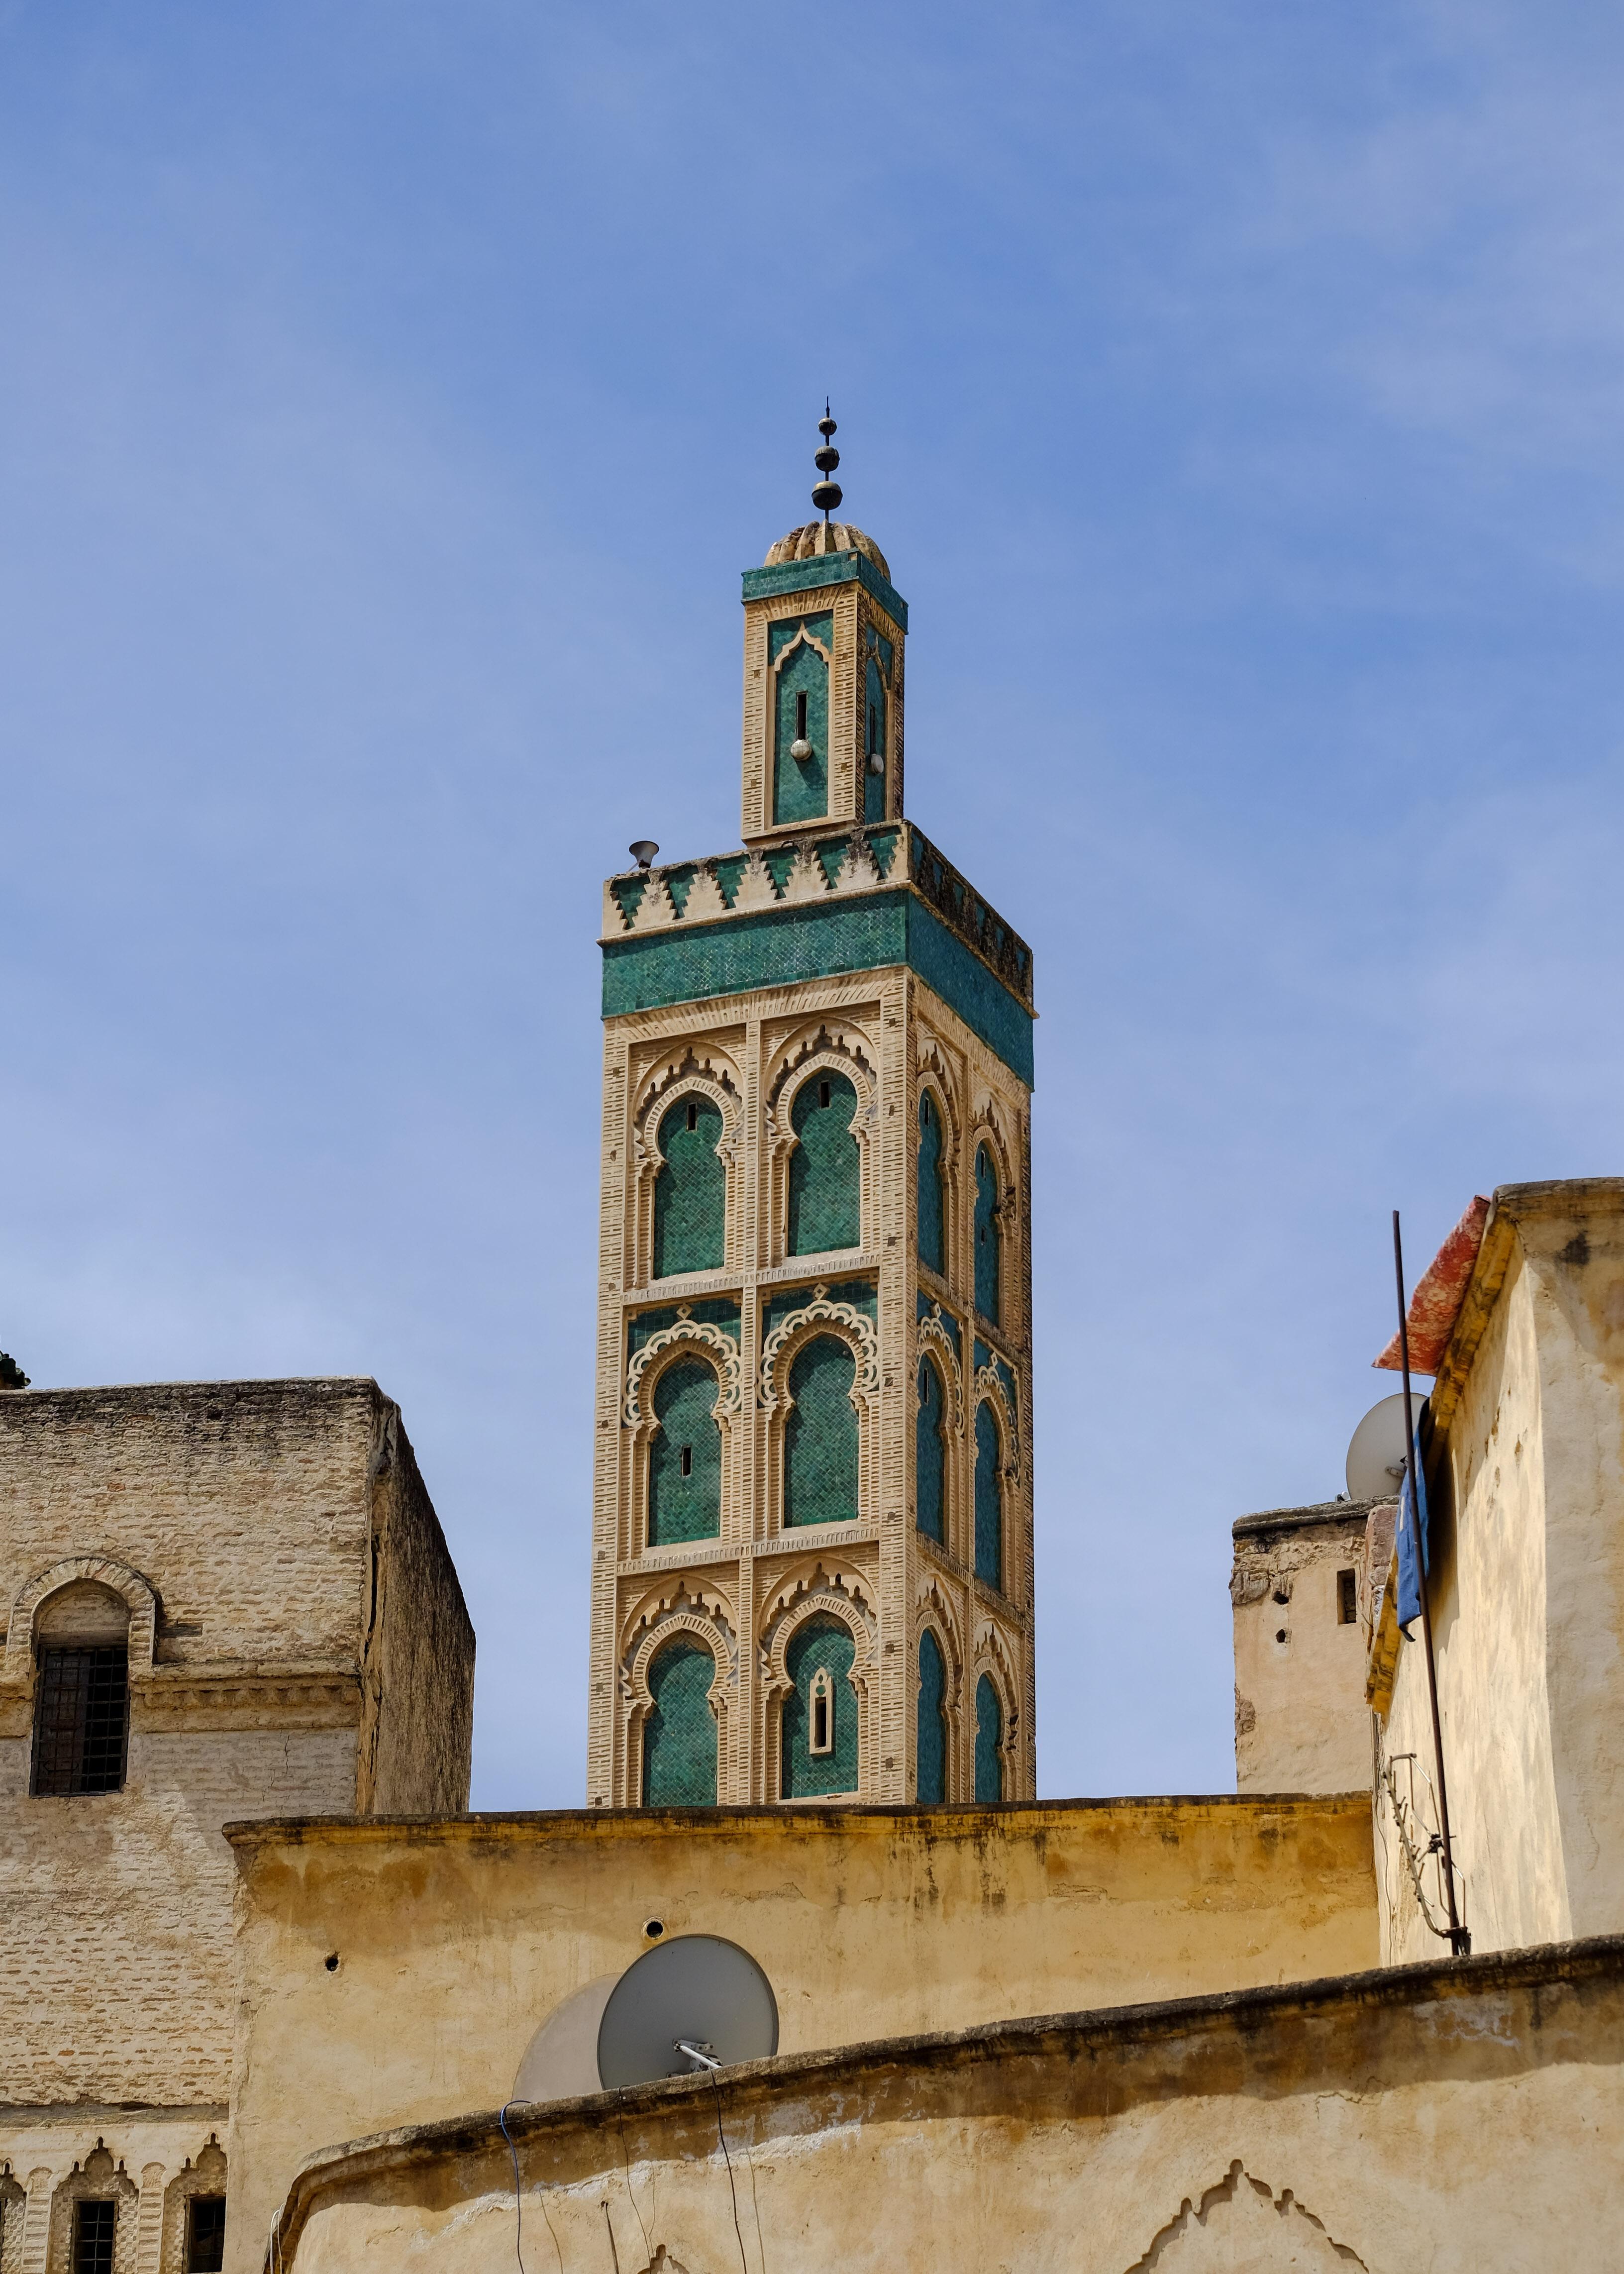 Maroc (8 of 20)